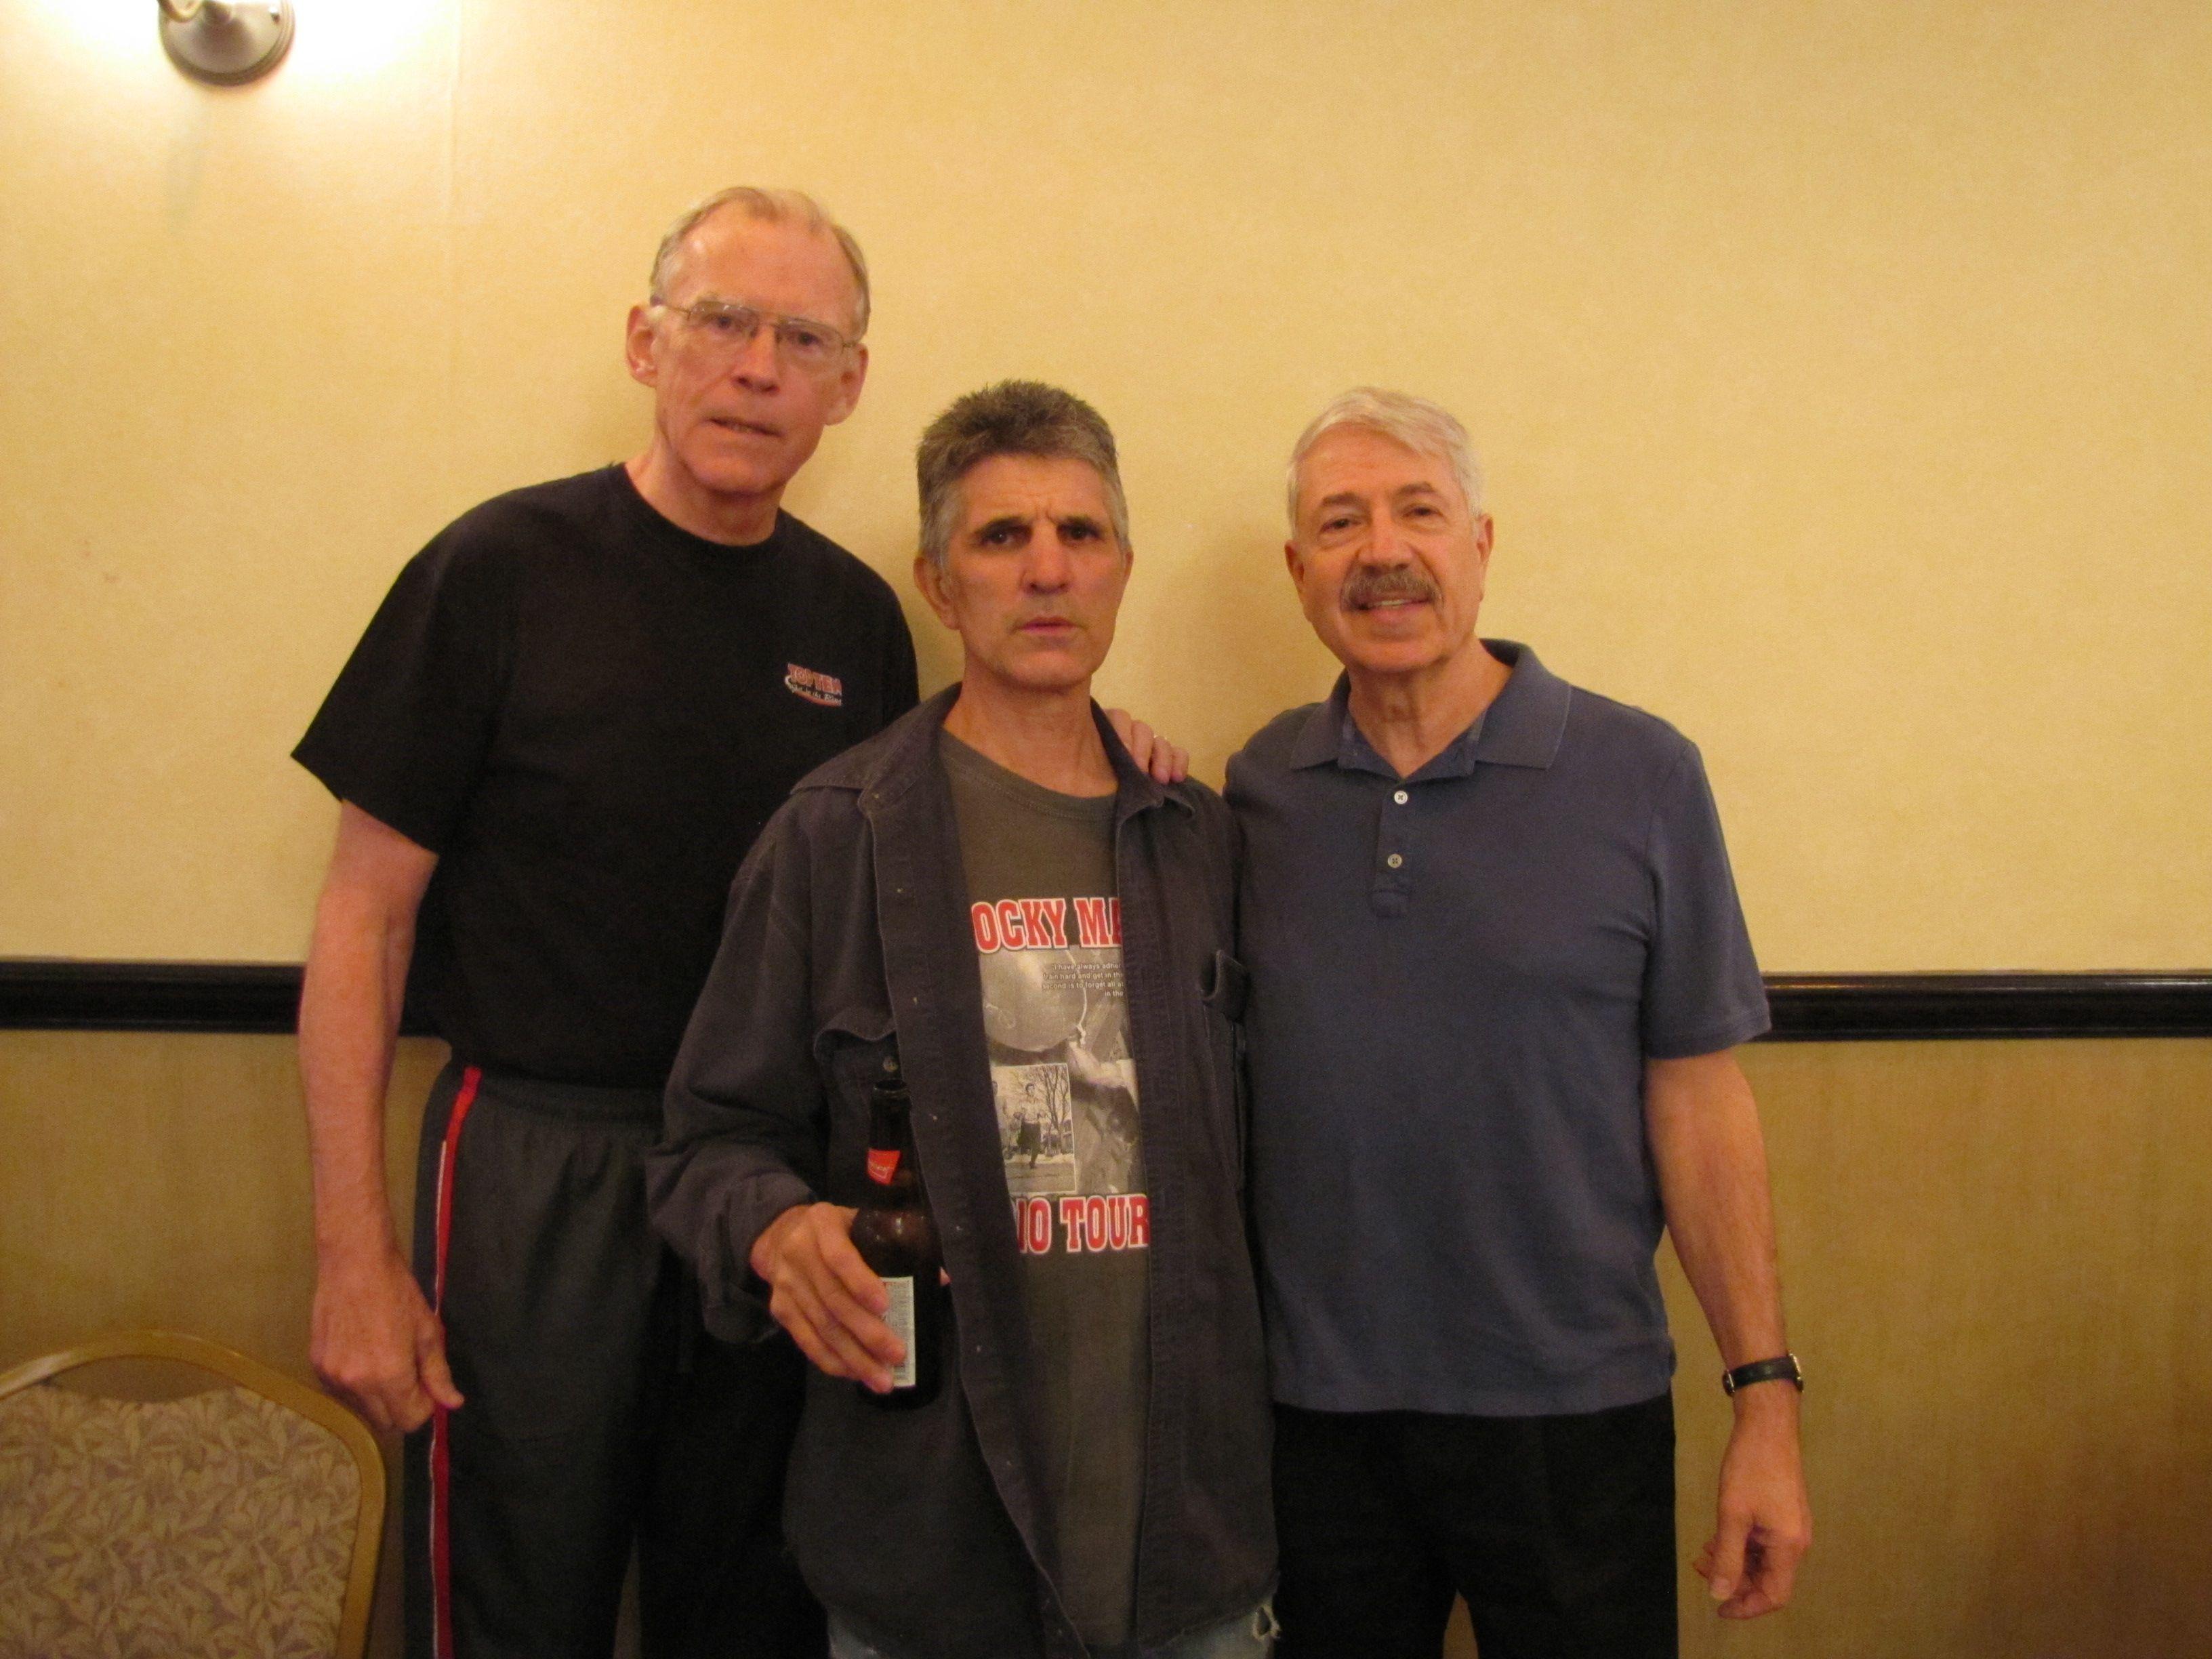 Florian Hall May 8, 2012